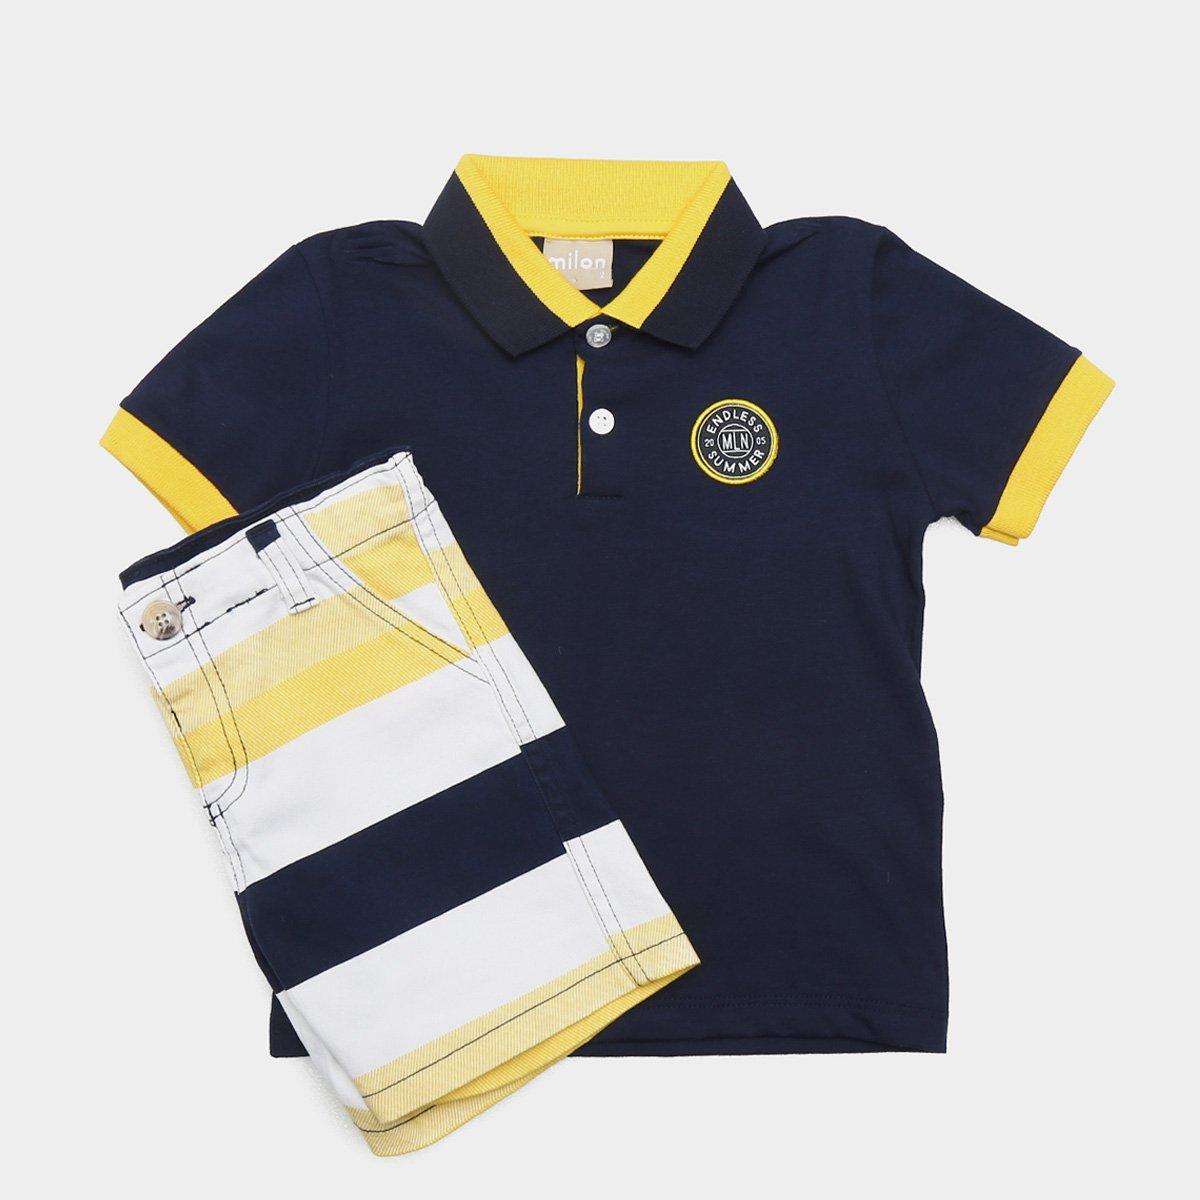 b94c333e6ee4c8 Conjunto de Camisa Polo + Bermuda Infantil Milon Masculino - Tam ...